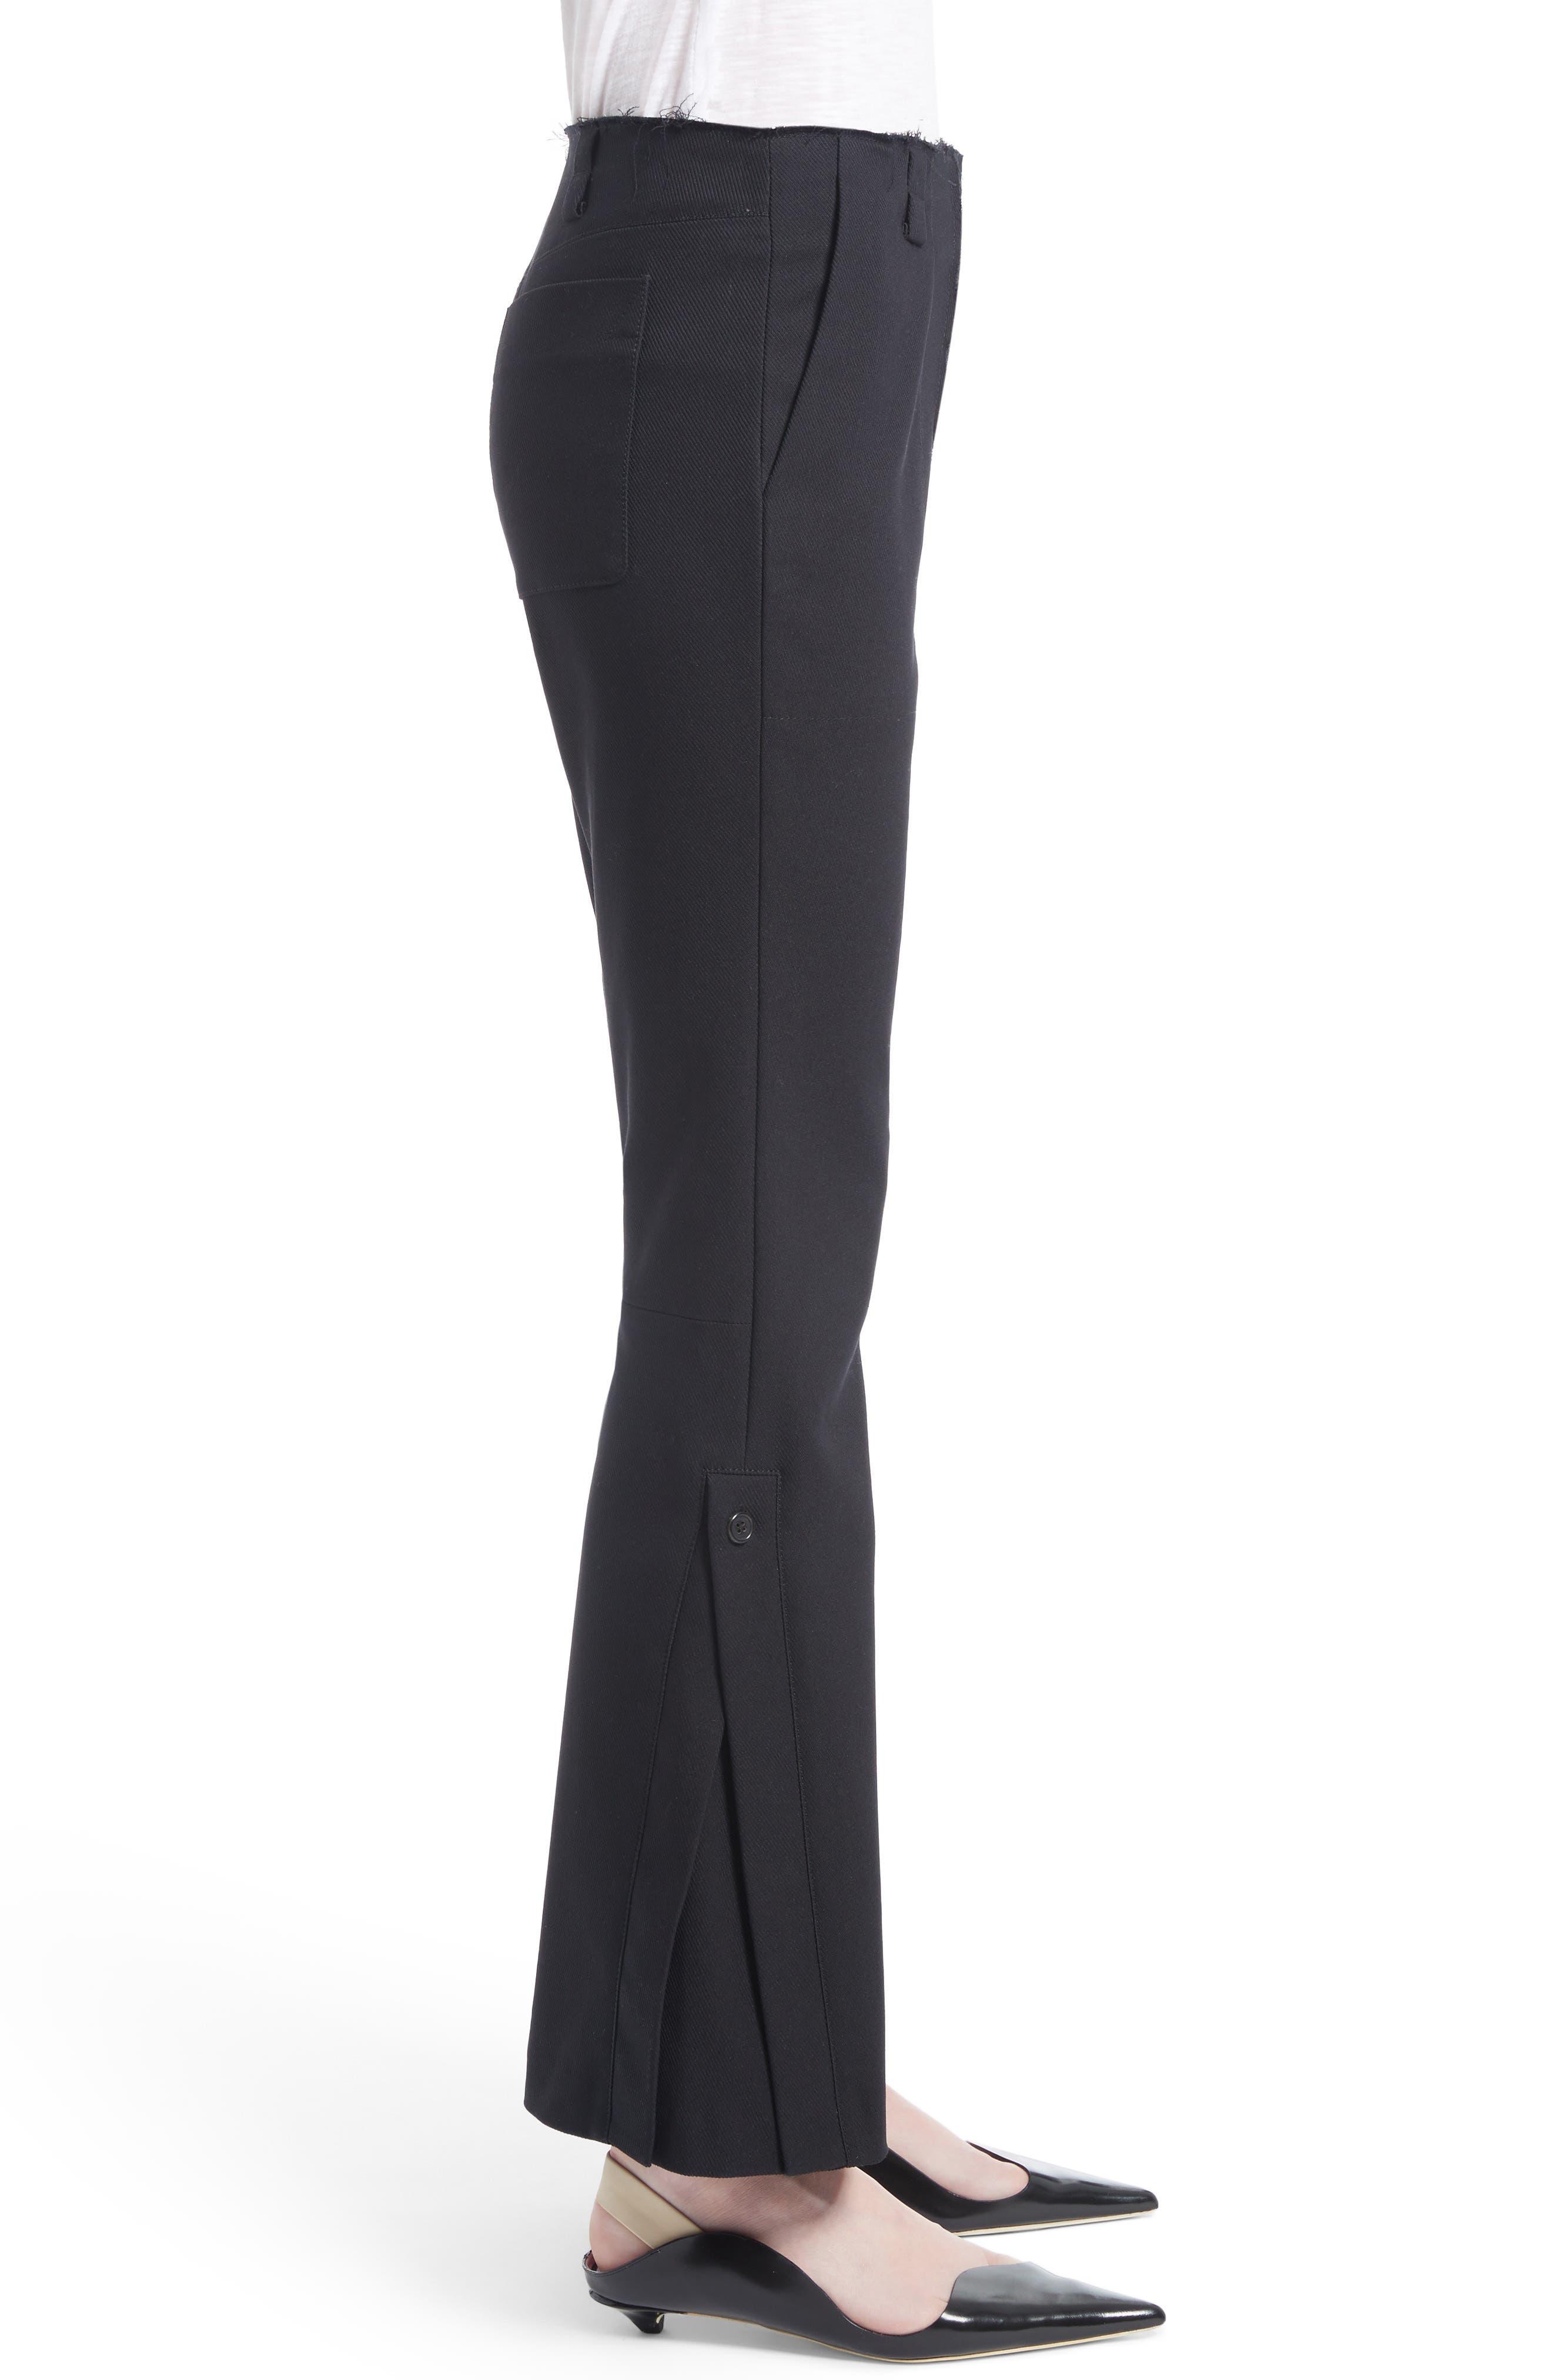 Alternate Image 3  - Proenza Schouler Stretch Cotton Blend Flare Pants